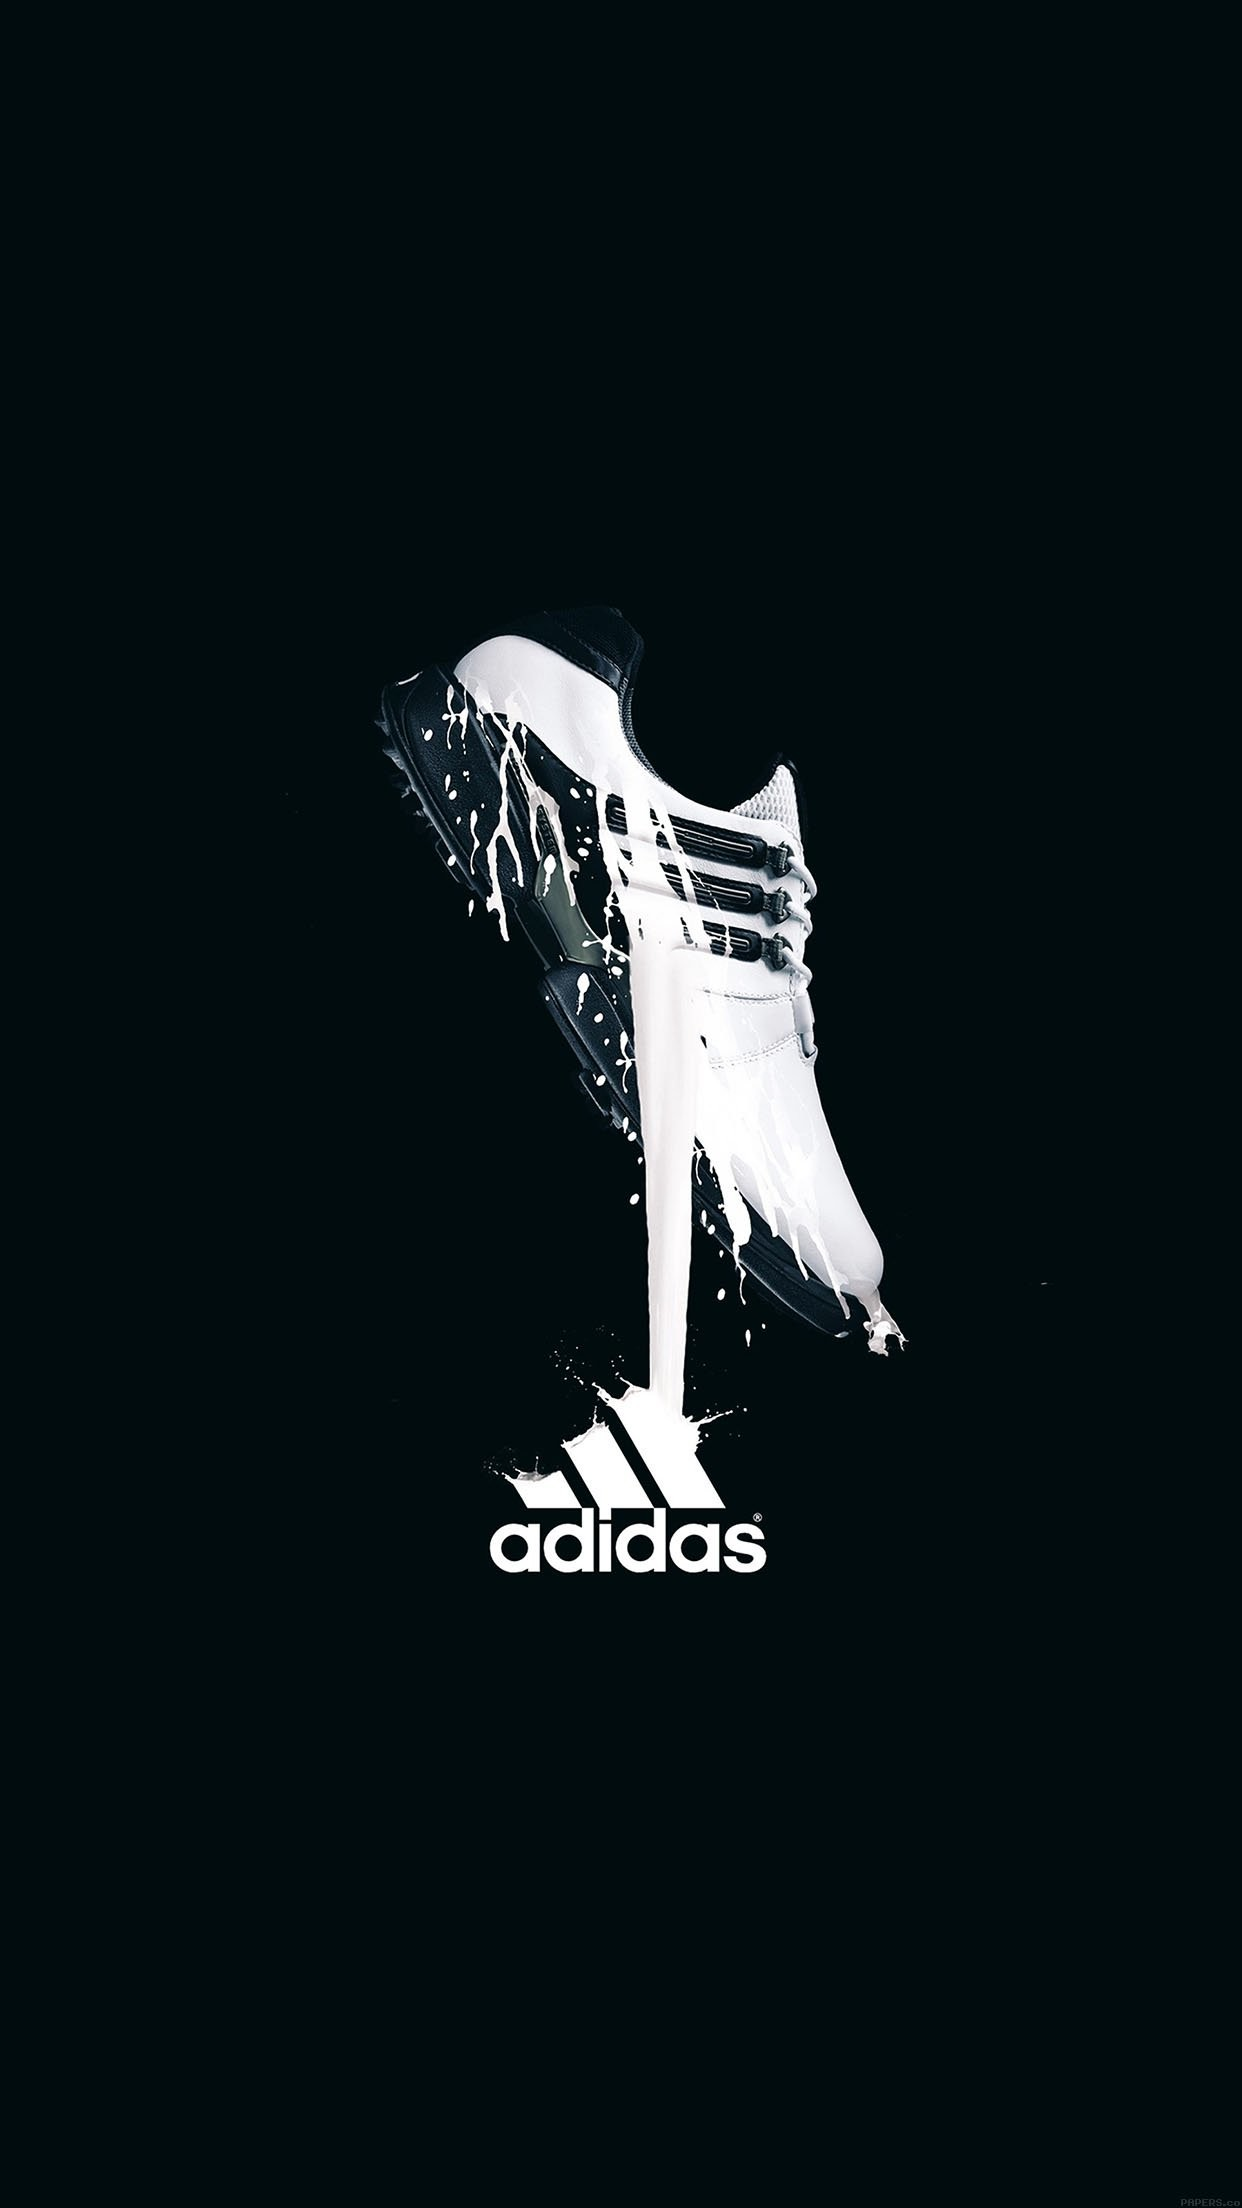 Adidas Wallpaper 2018 72 Images